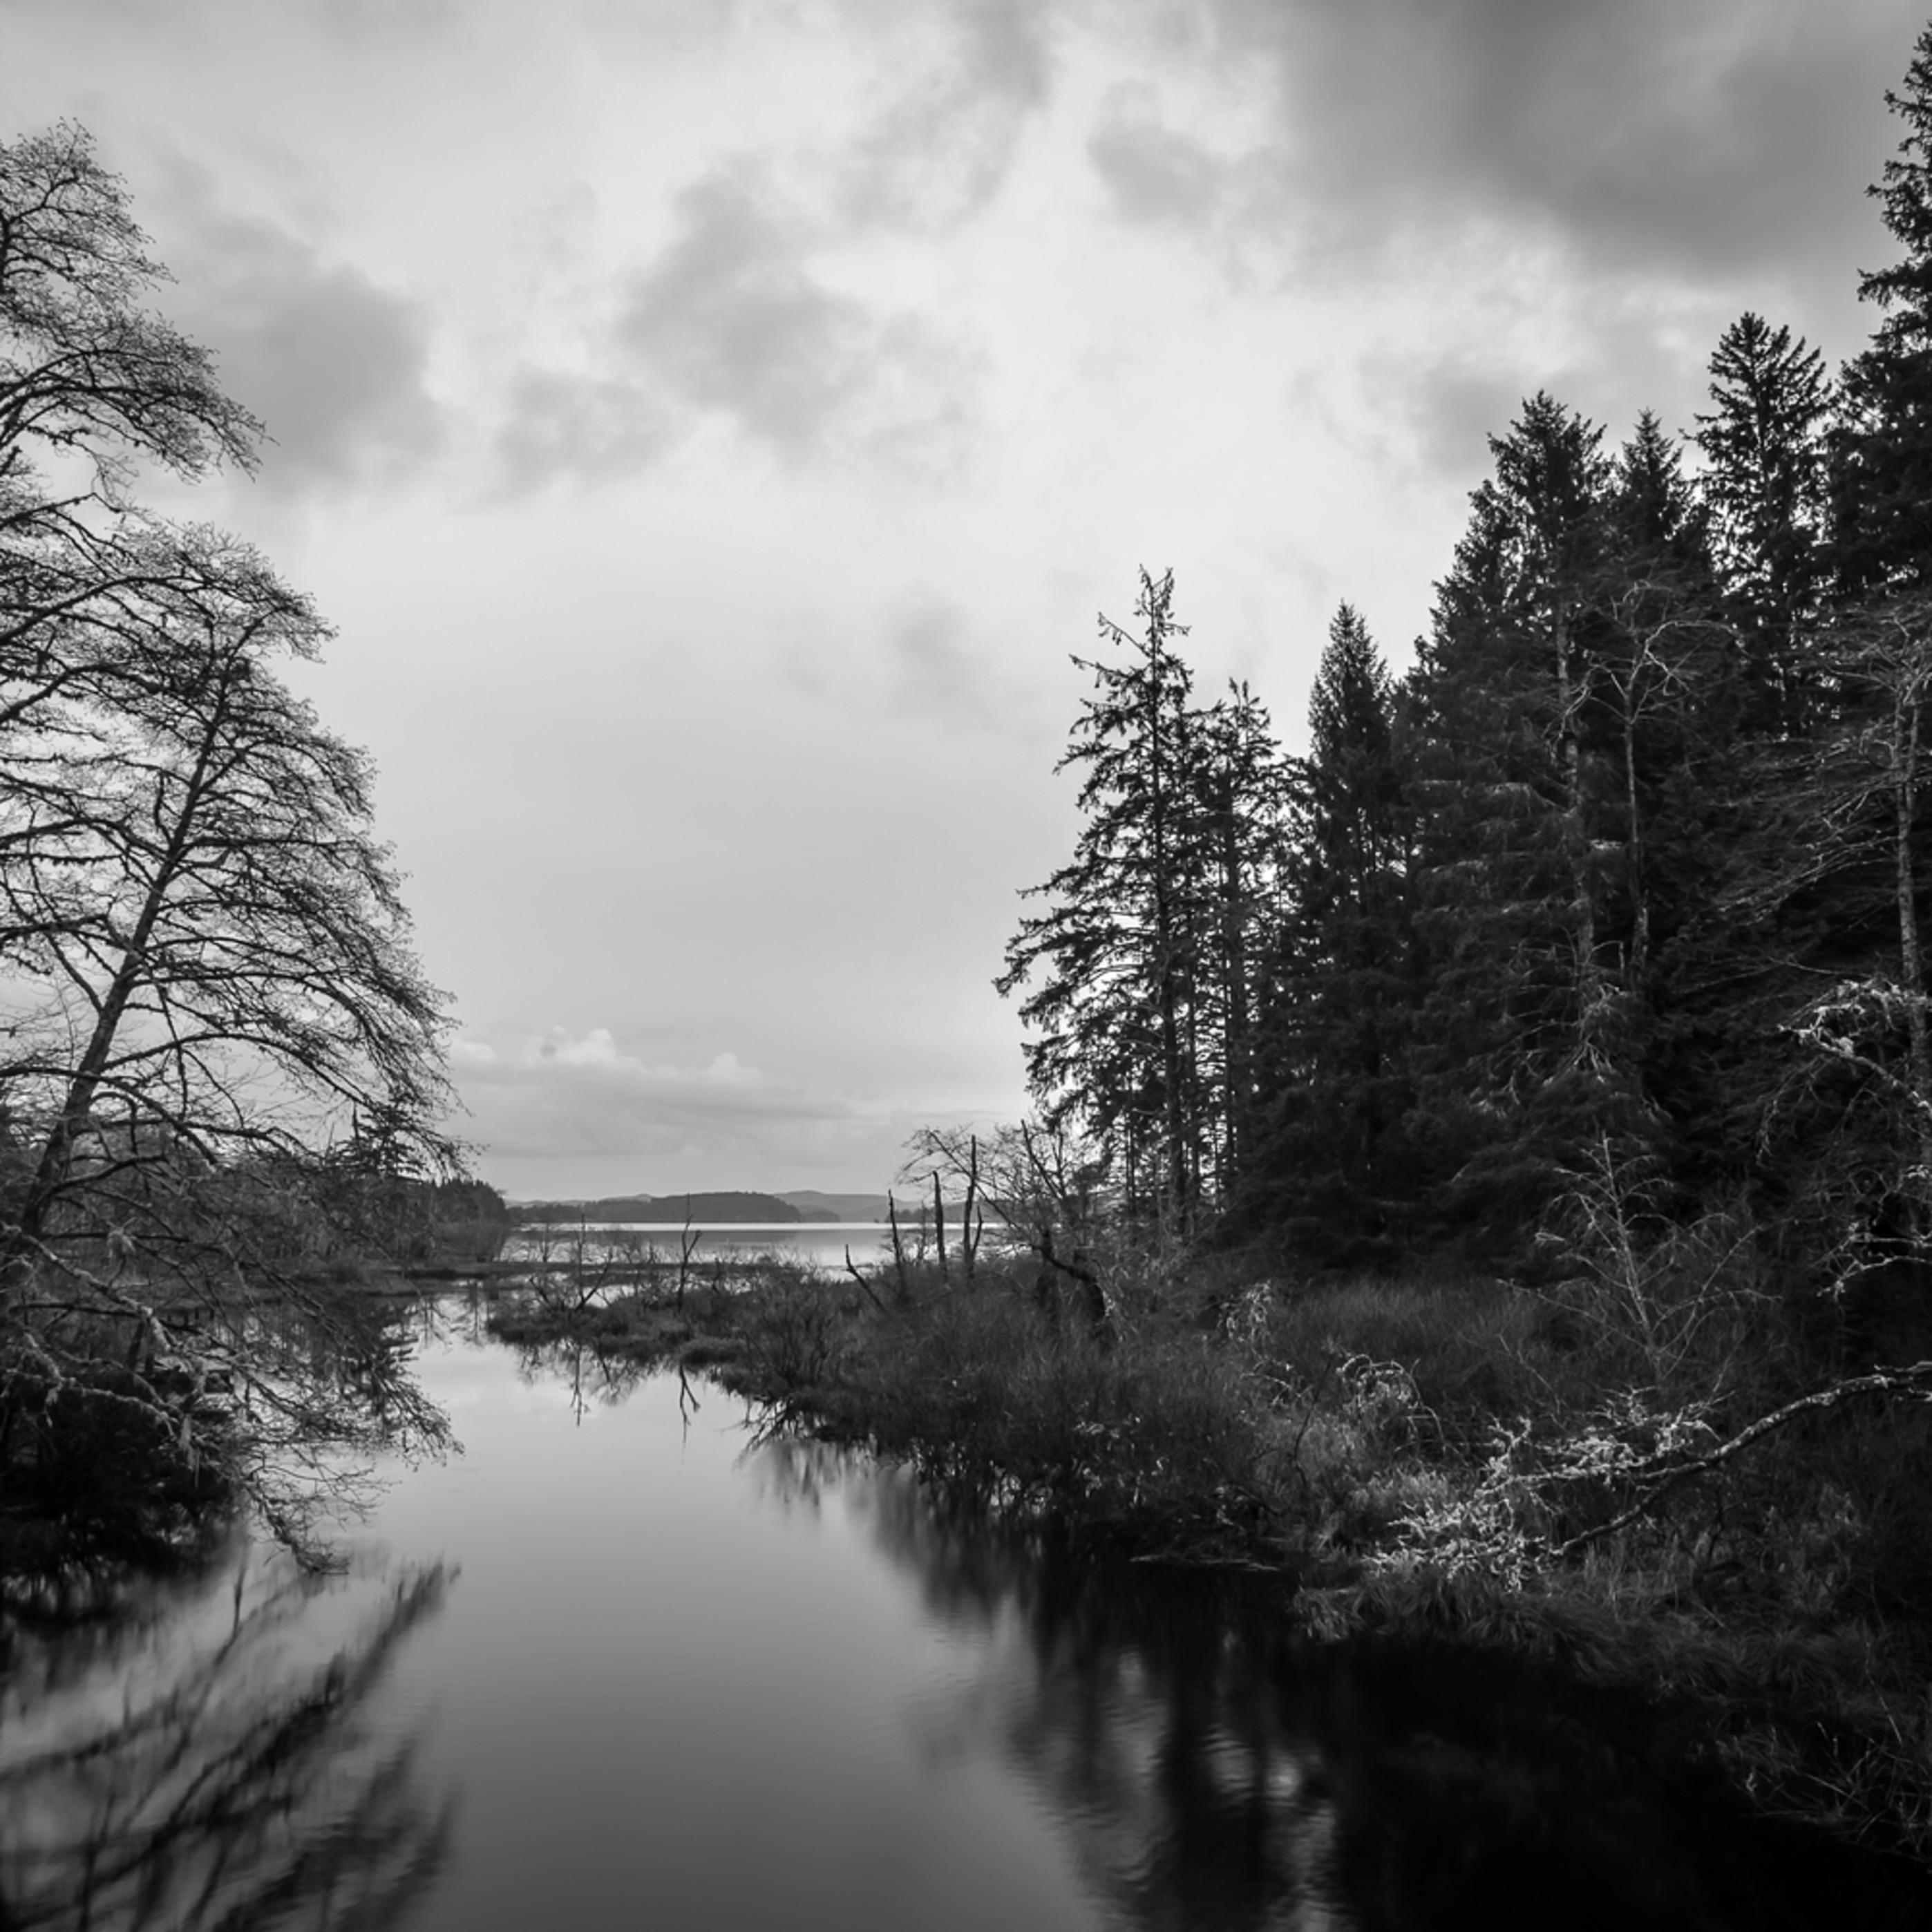 Headwaters ozette river olympic national park washington 2016 zm3xuc